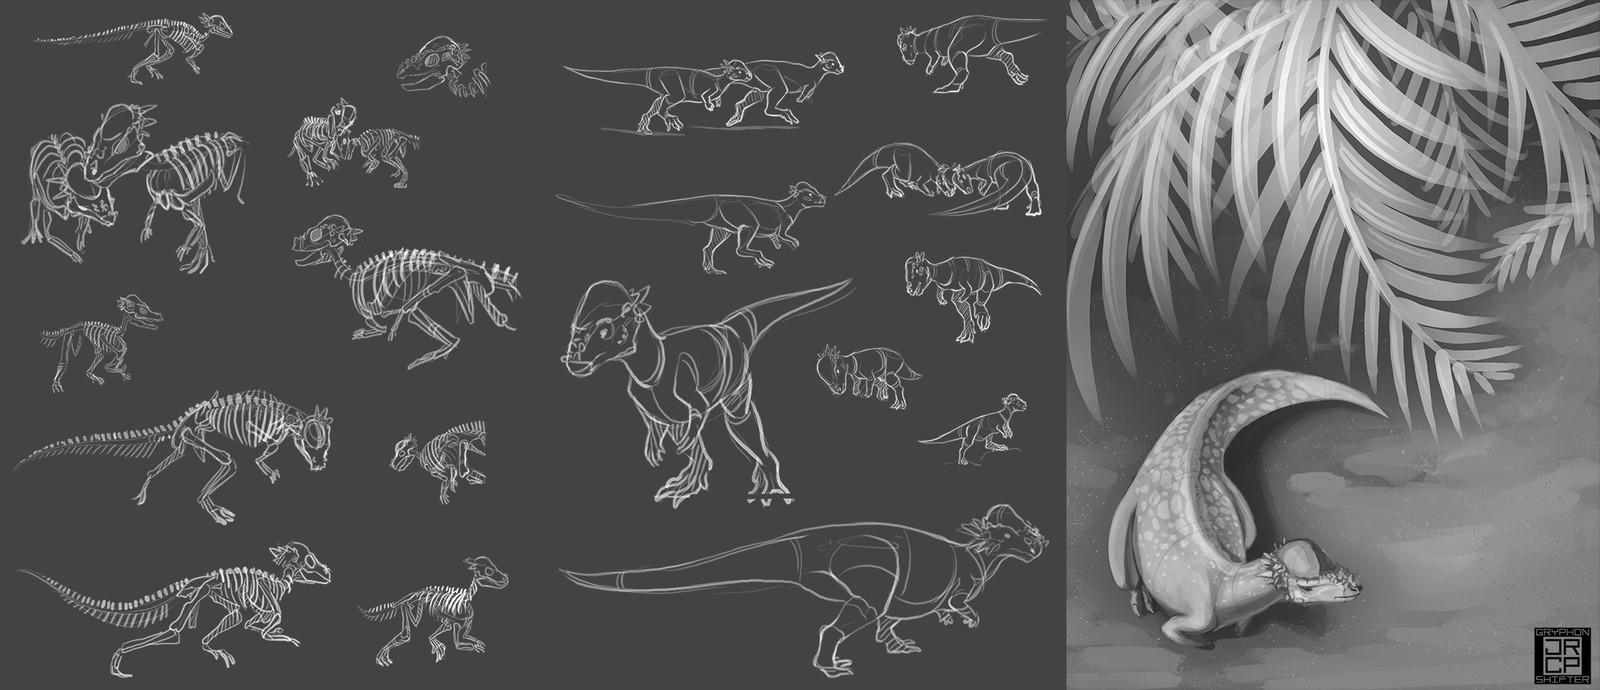 11: Pachycephalosaurus